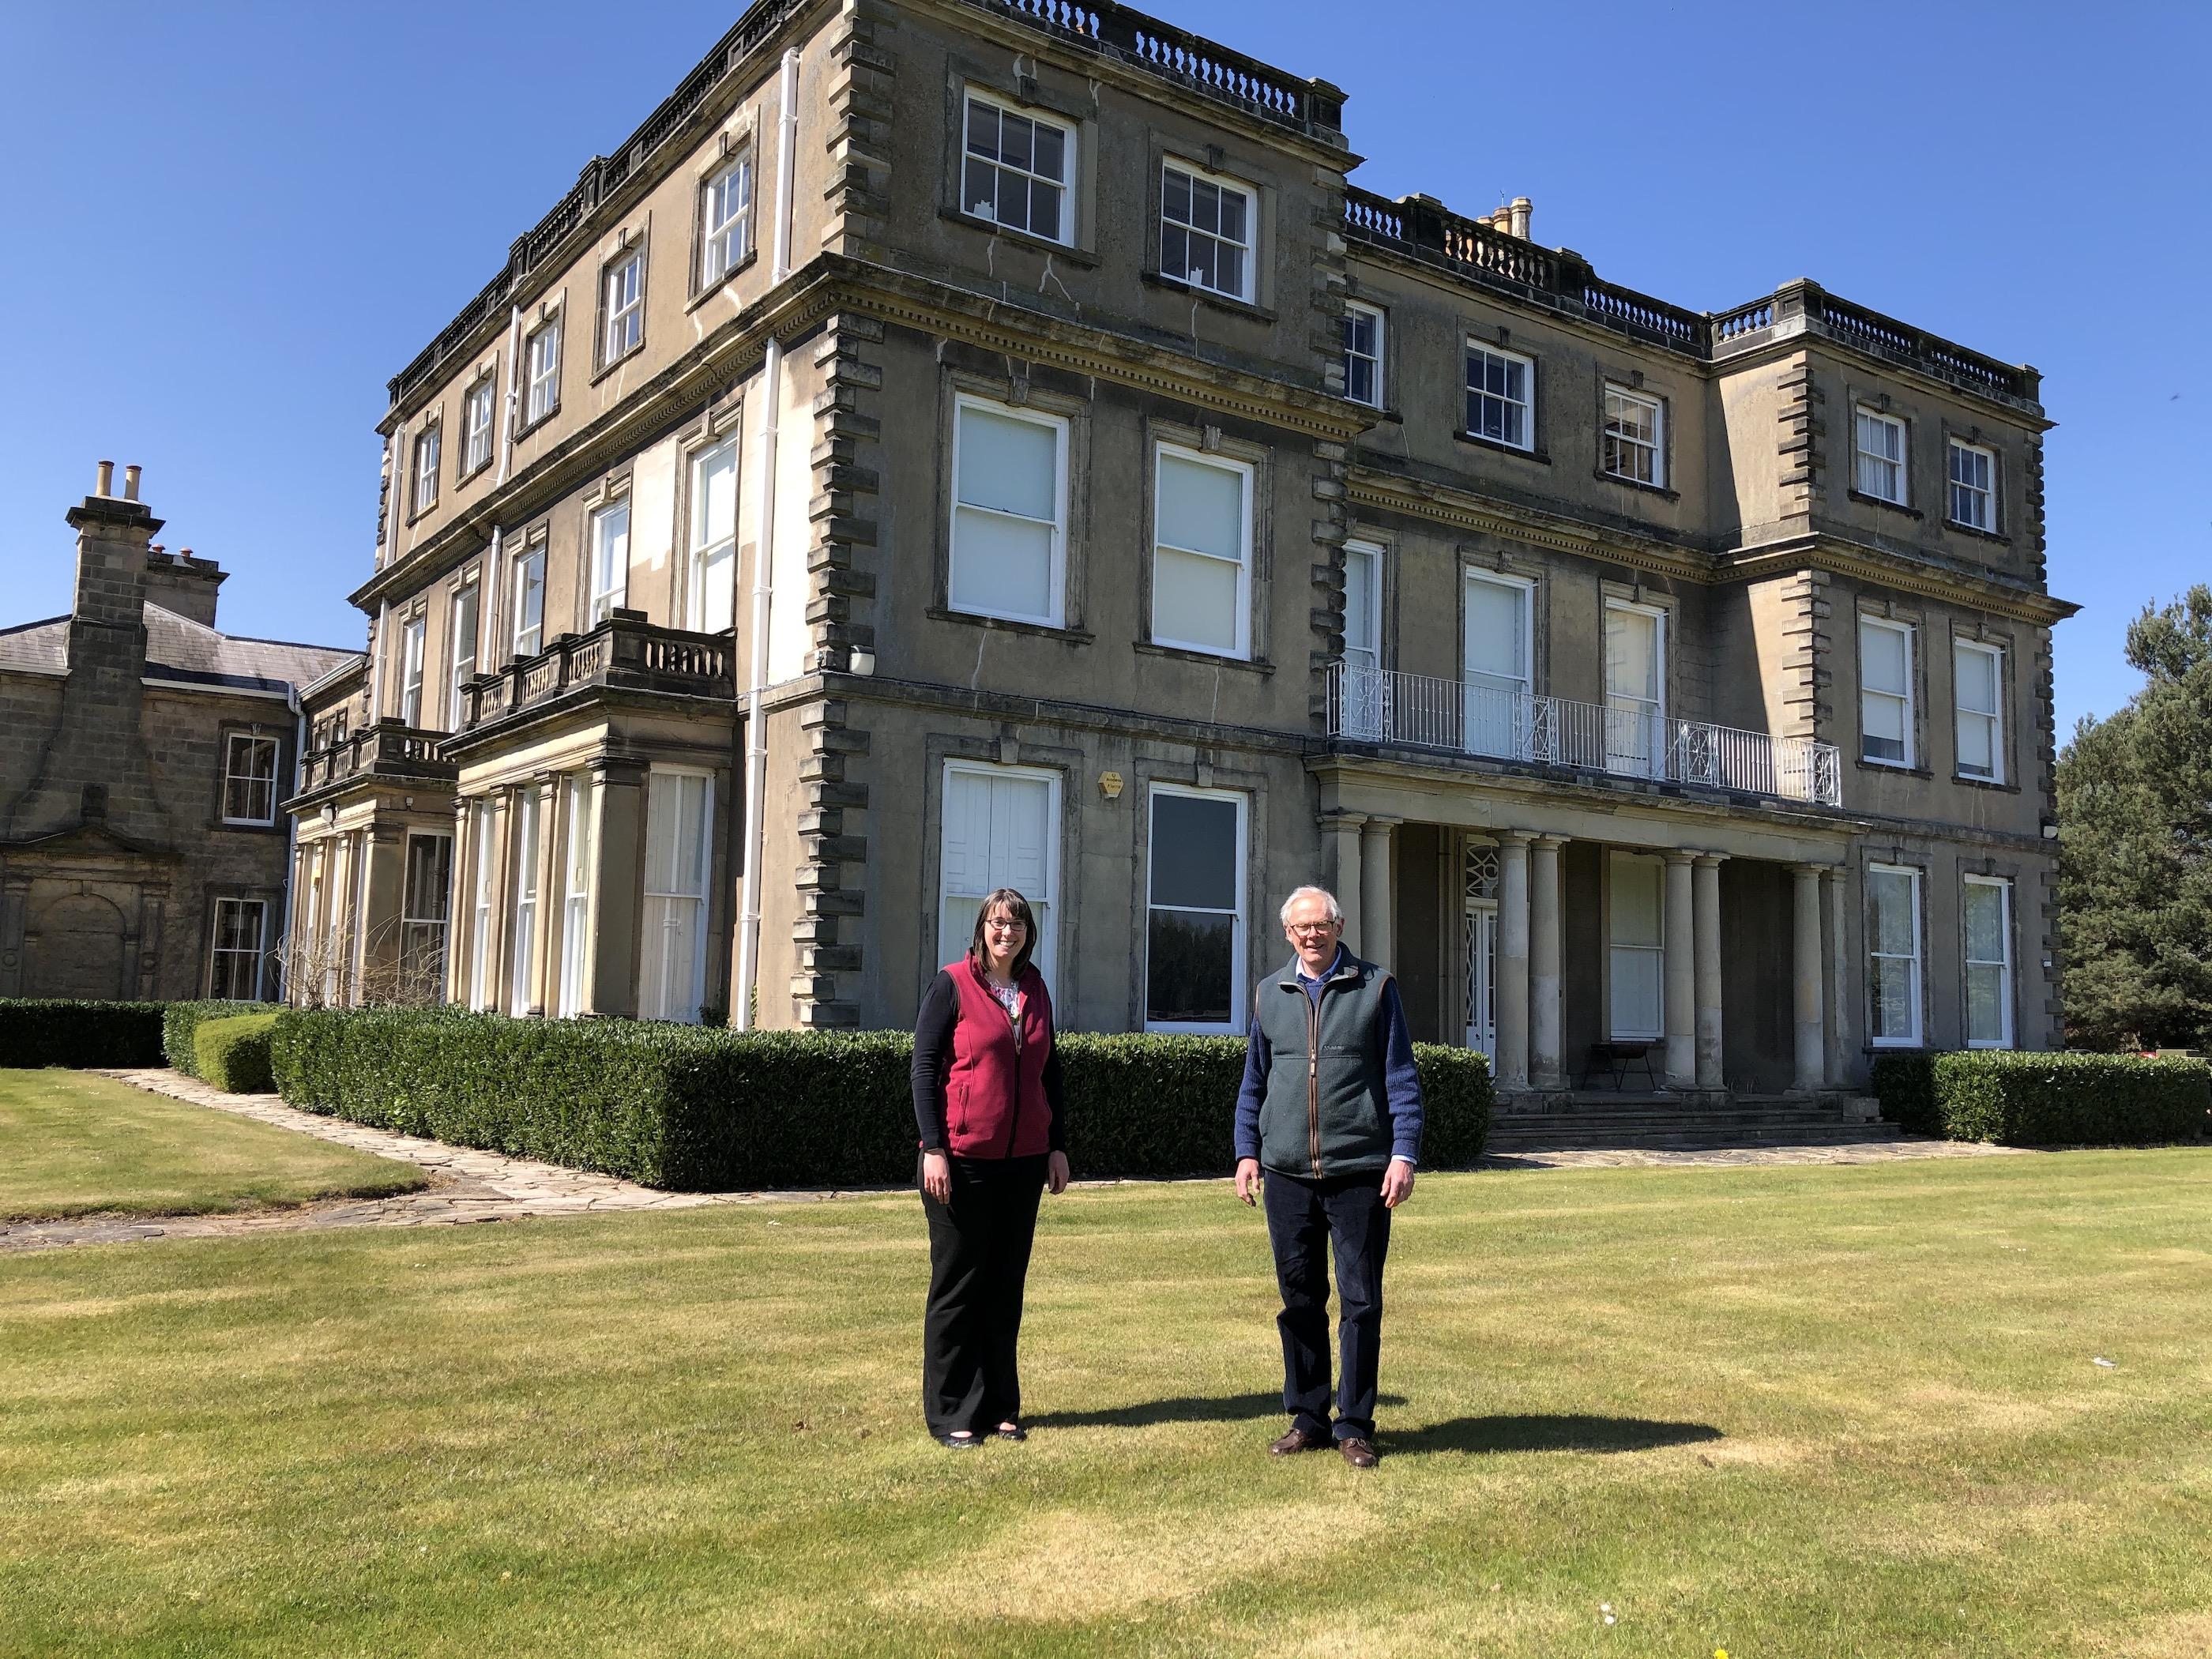 Estate management contract for Lockington Estate won by Mather Jamie